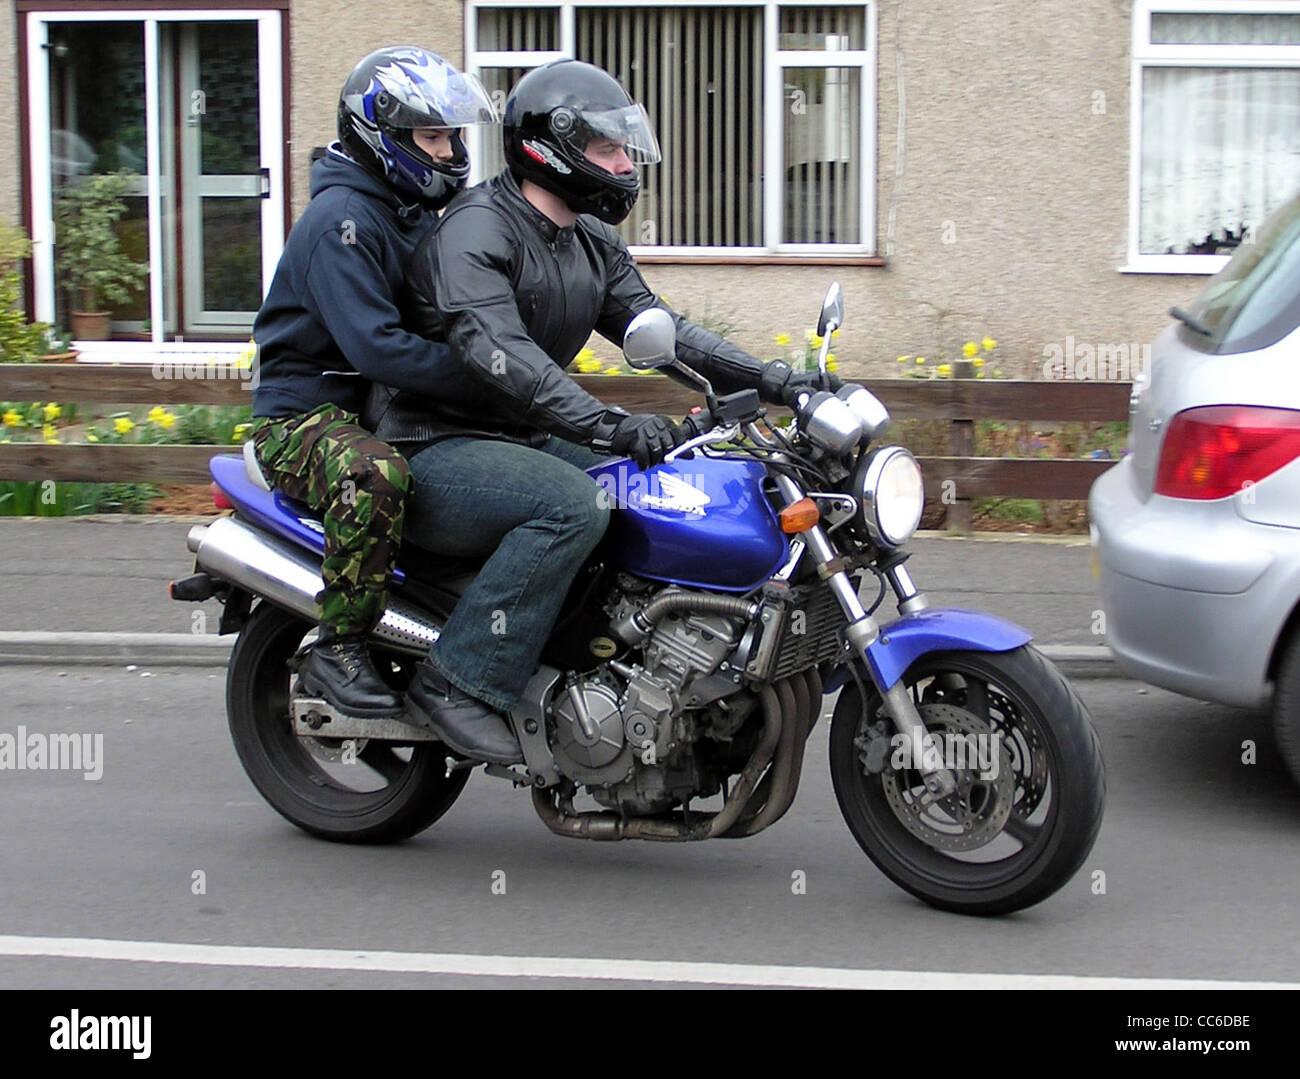 Honda Hornet Stock Photos & Honda Hornet Stock Images - Alamy